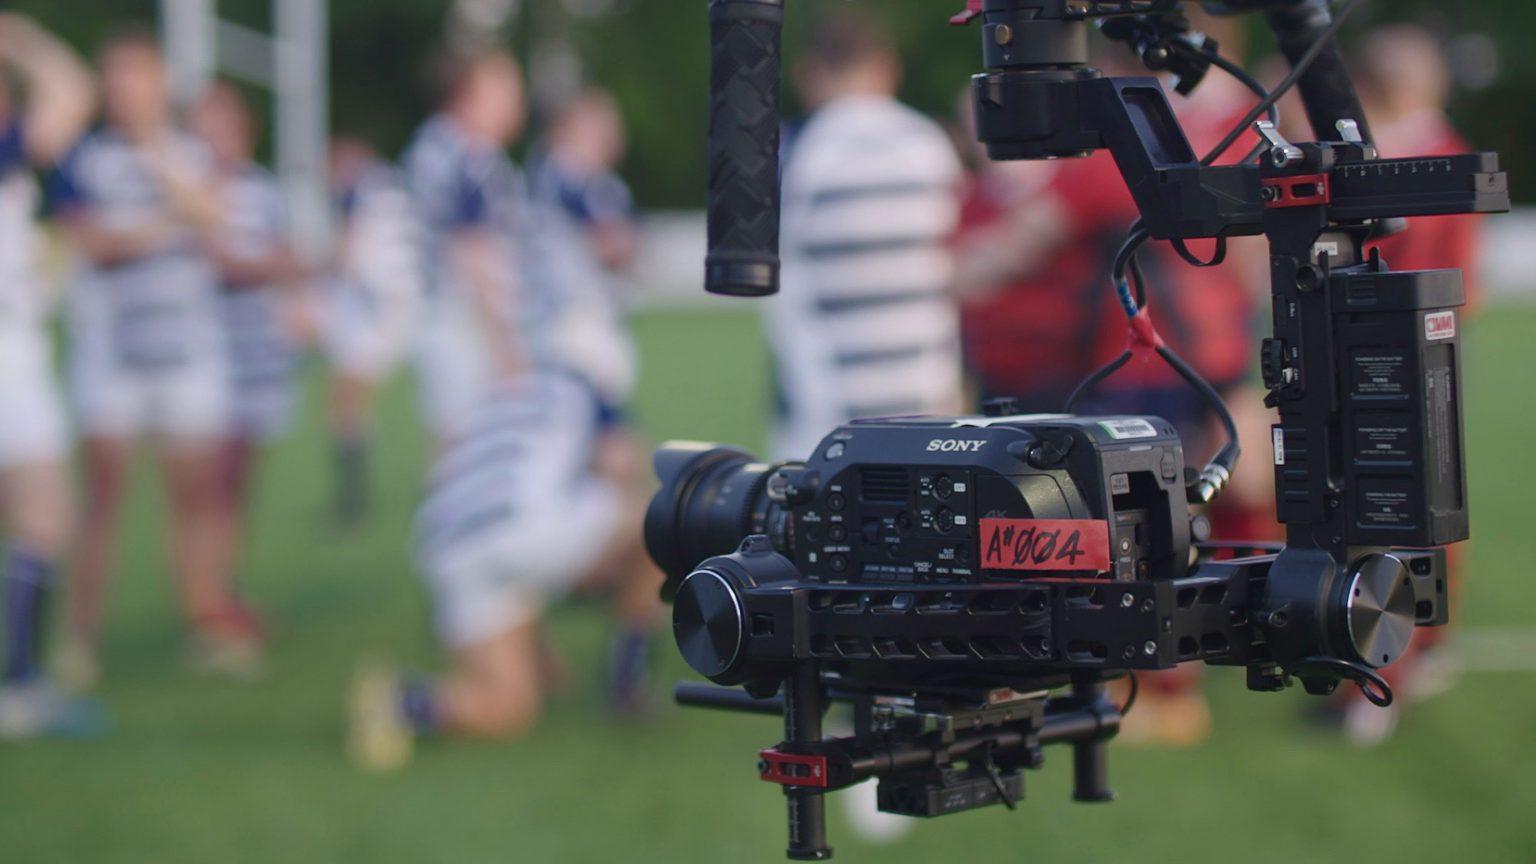 camera crew, filming behind the scenes